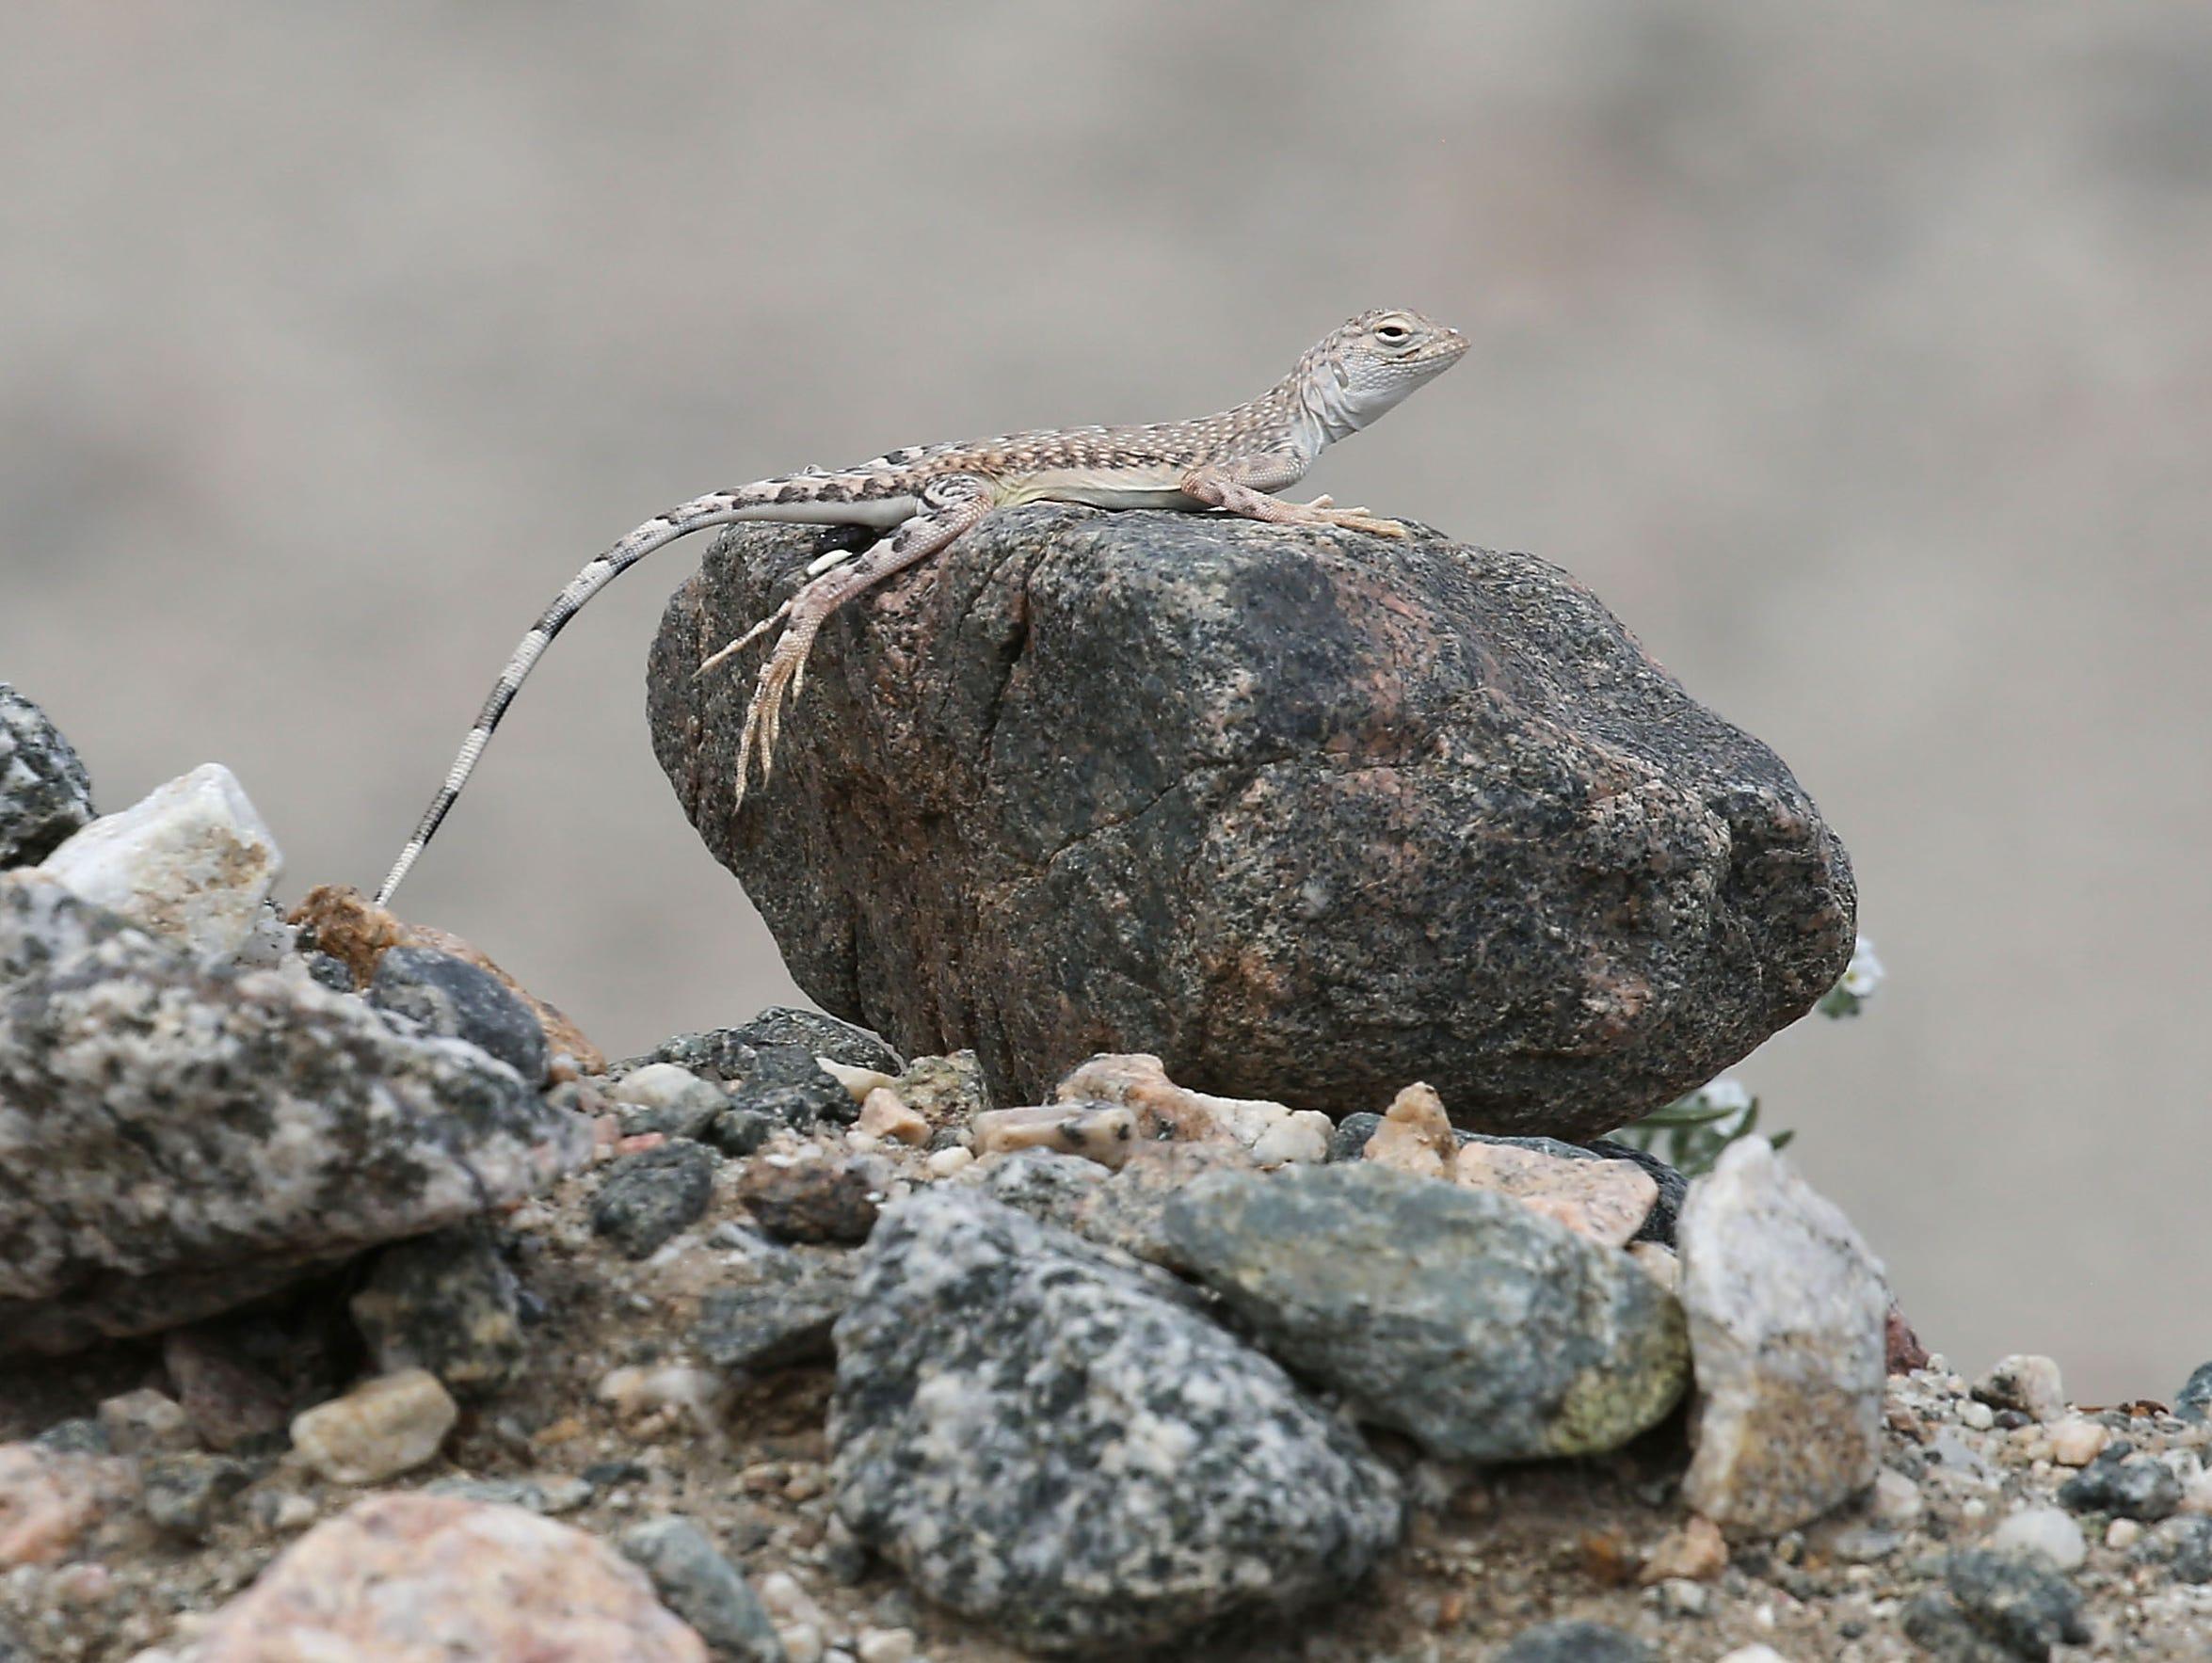 A zebra-tailed lizard in the Mojave Desert.